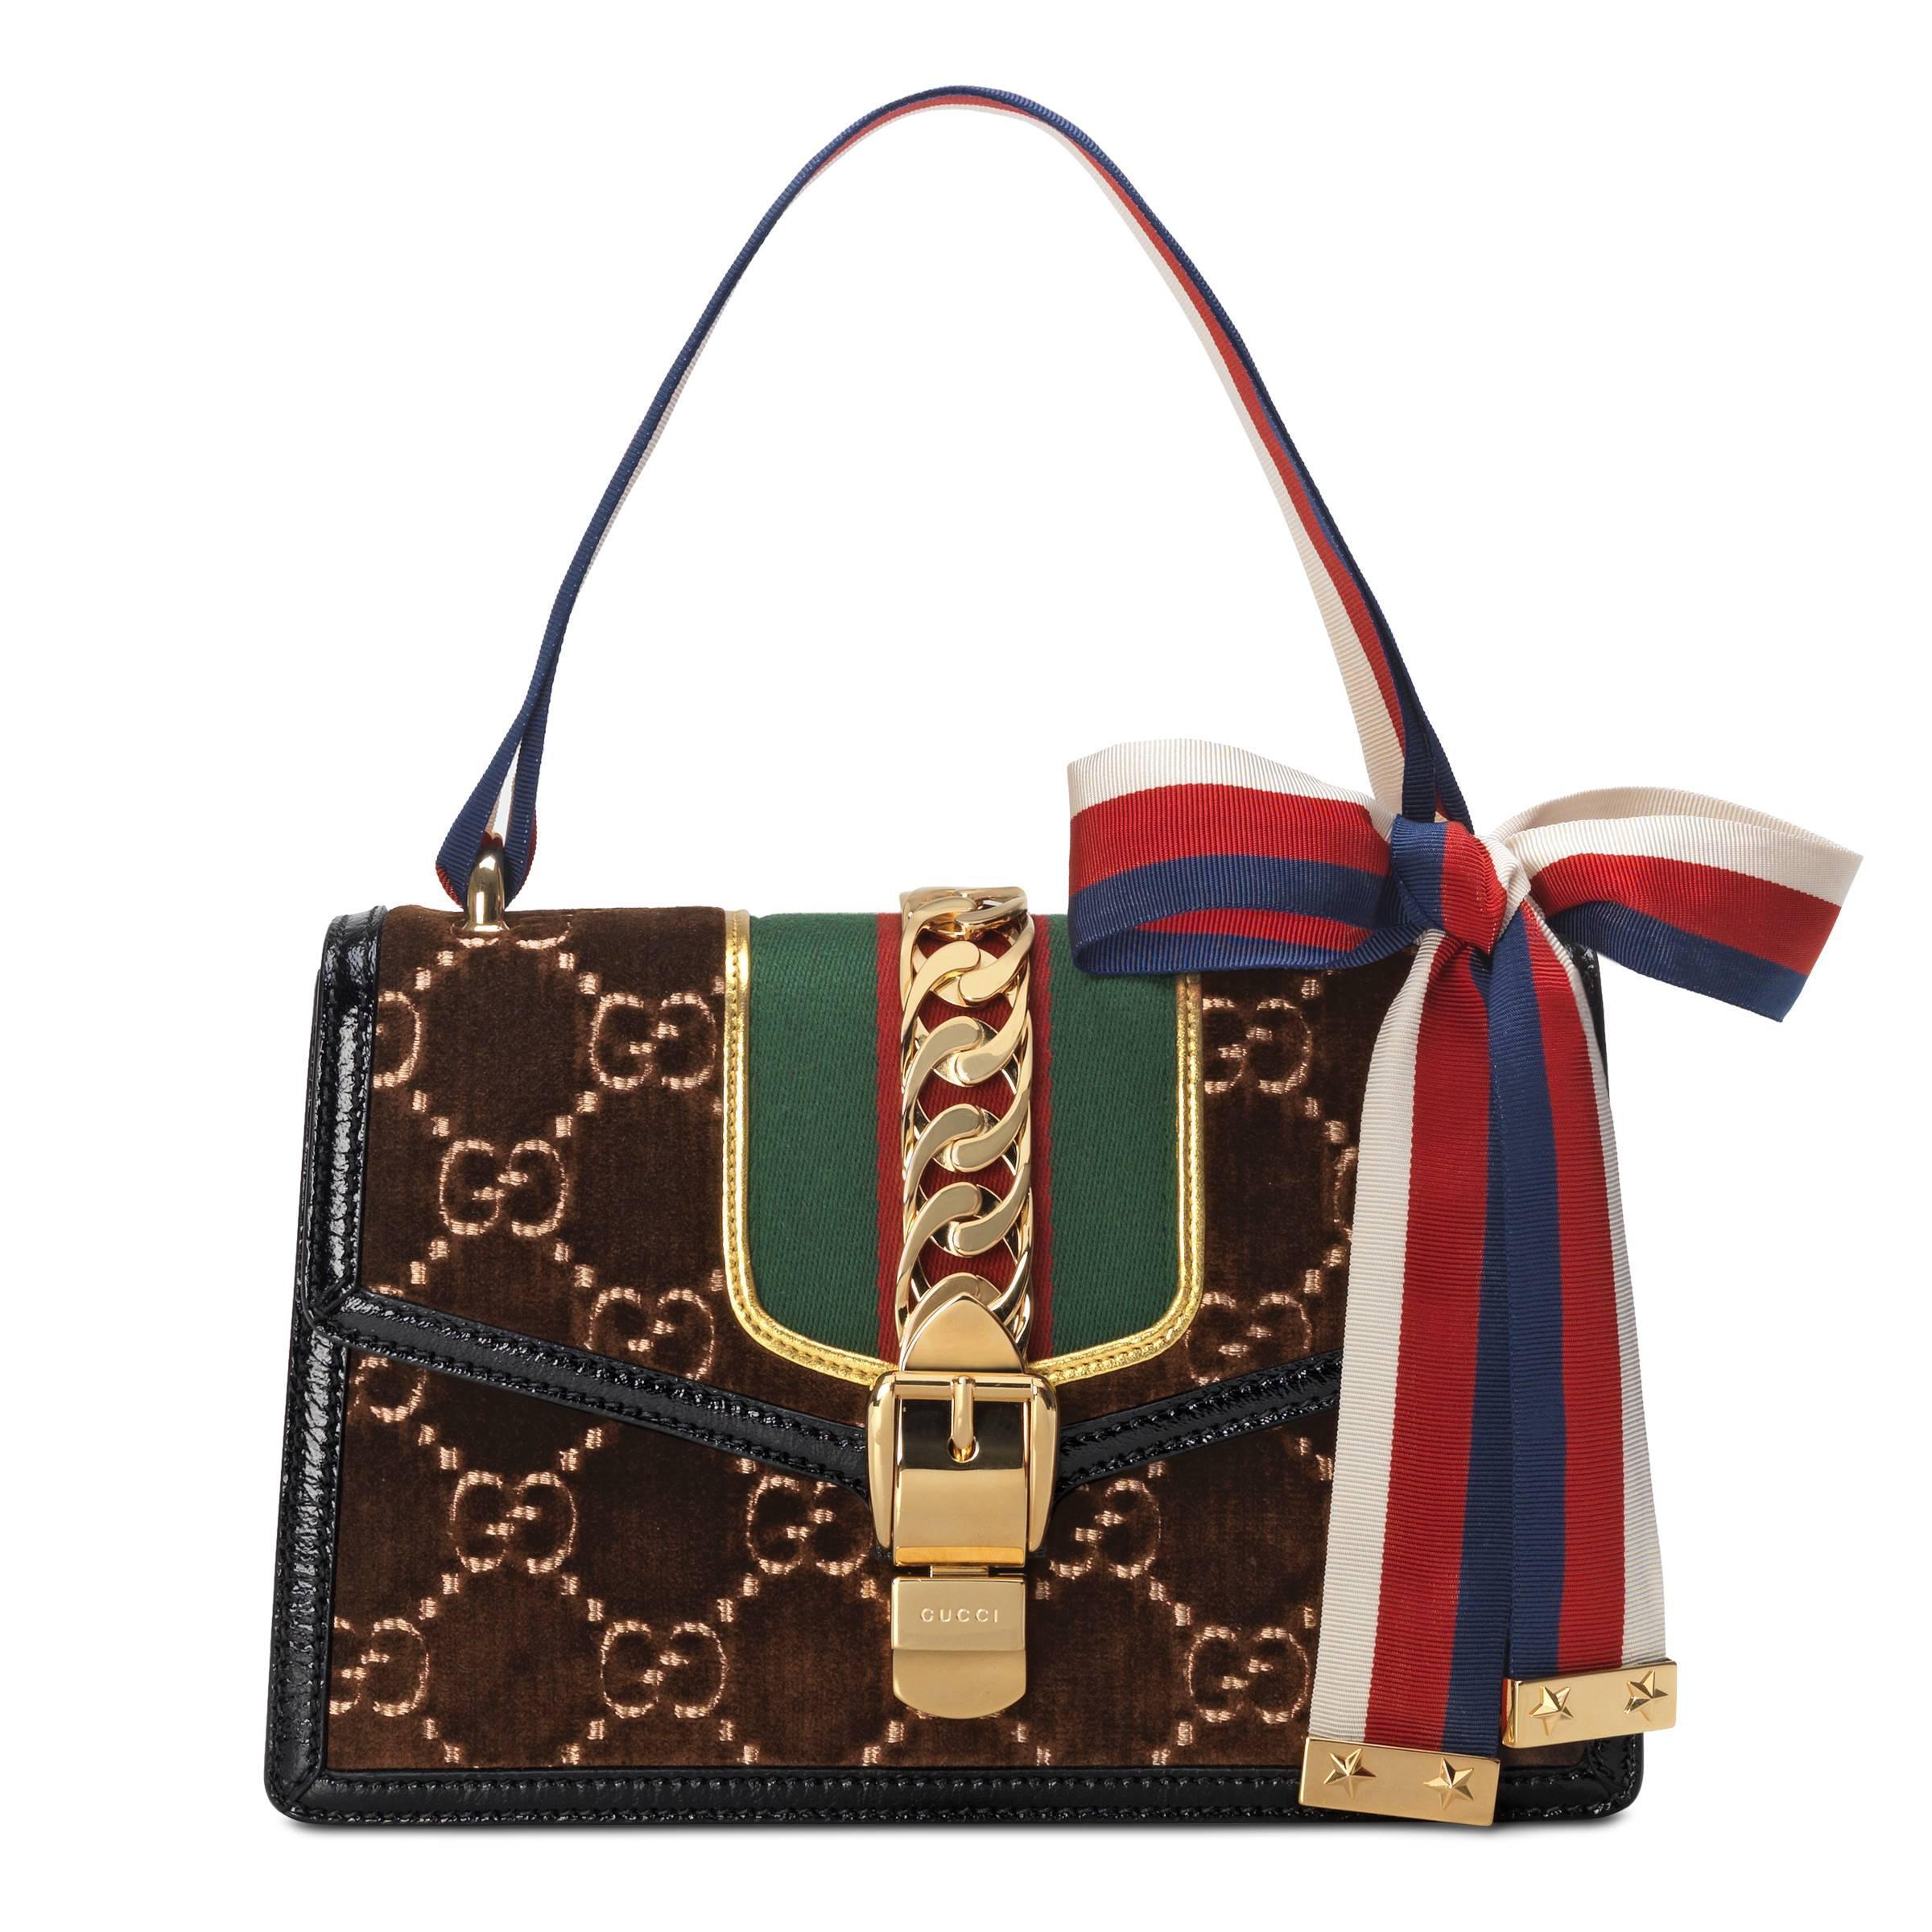 ff0d0b8c1 ... Brown Sylvie GG Velvet Small Shoulder Bag - Lyst. Visit Gucci. Tap to  visit site